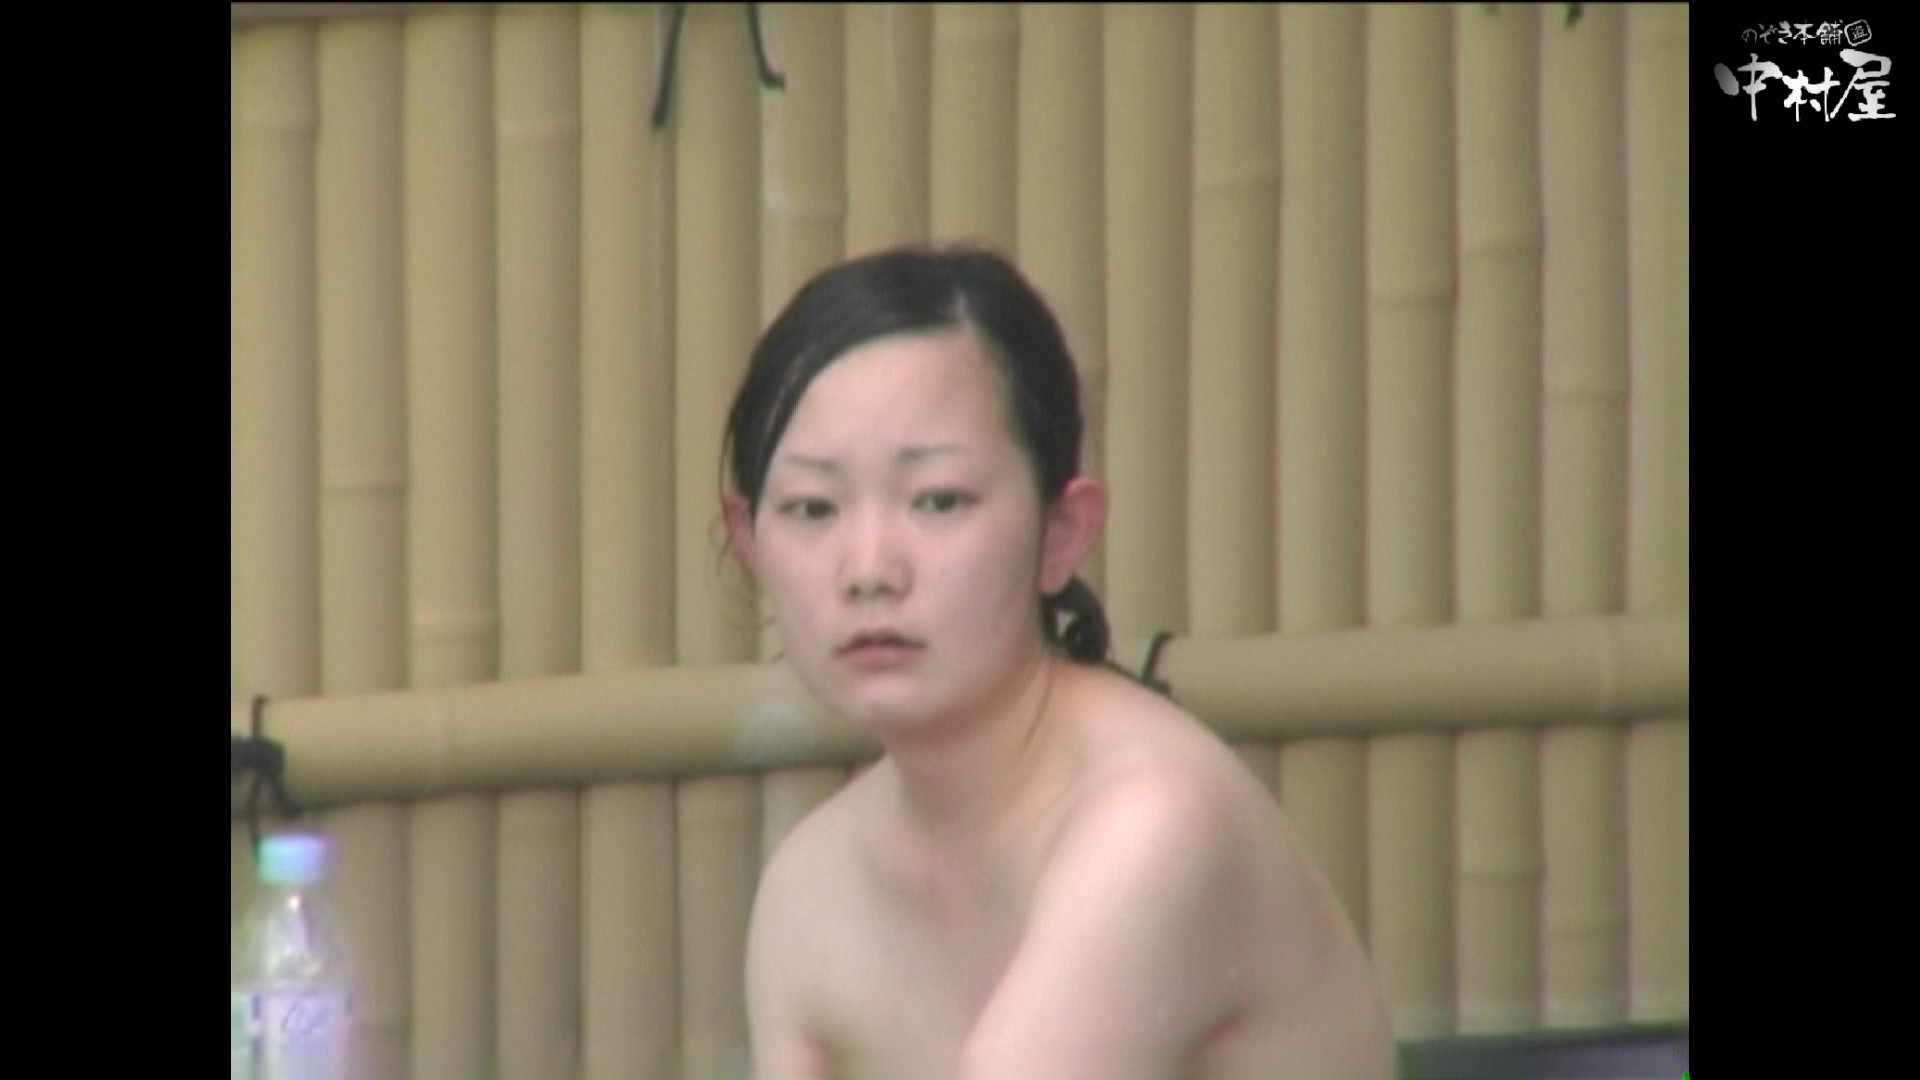 Aquaな露天風呂Vol.892 露天風呂   OLのエロ生活  39連発 10